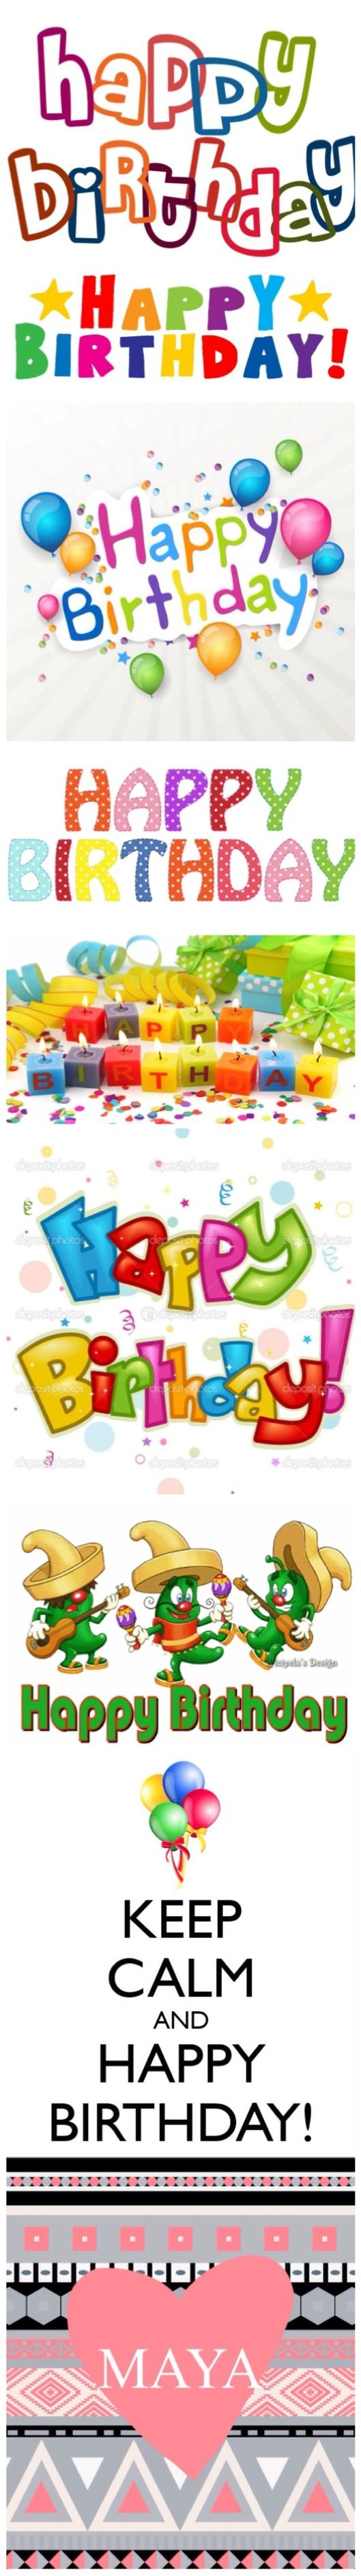 14 best Birthdays images on Pinterest